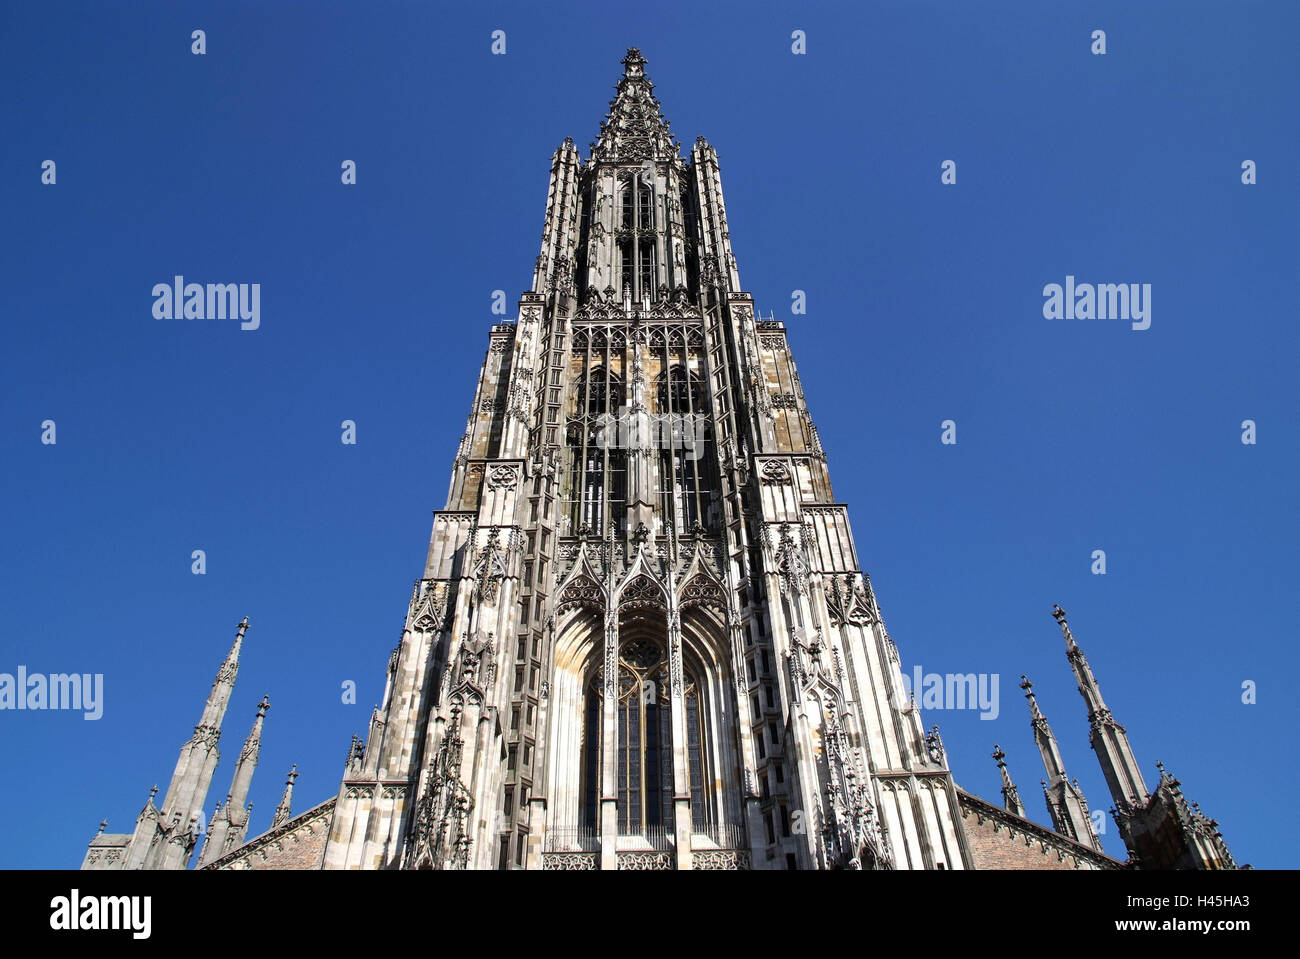 Germany, Baden-Württemberg, Ulm, Minster, Stock Photo